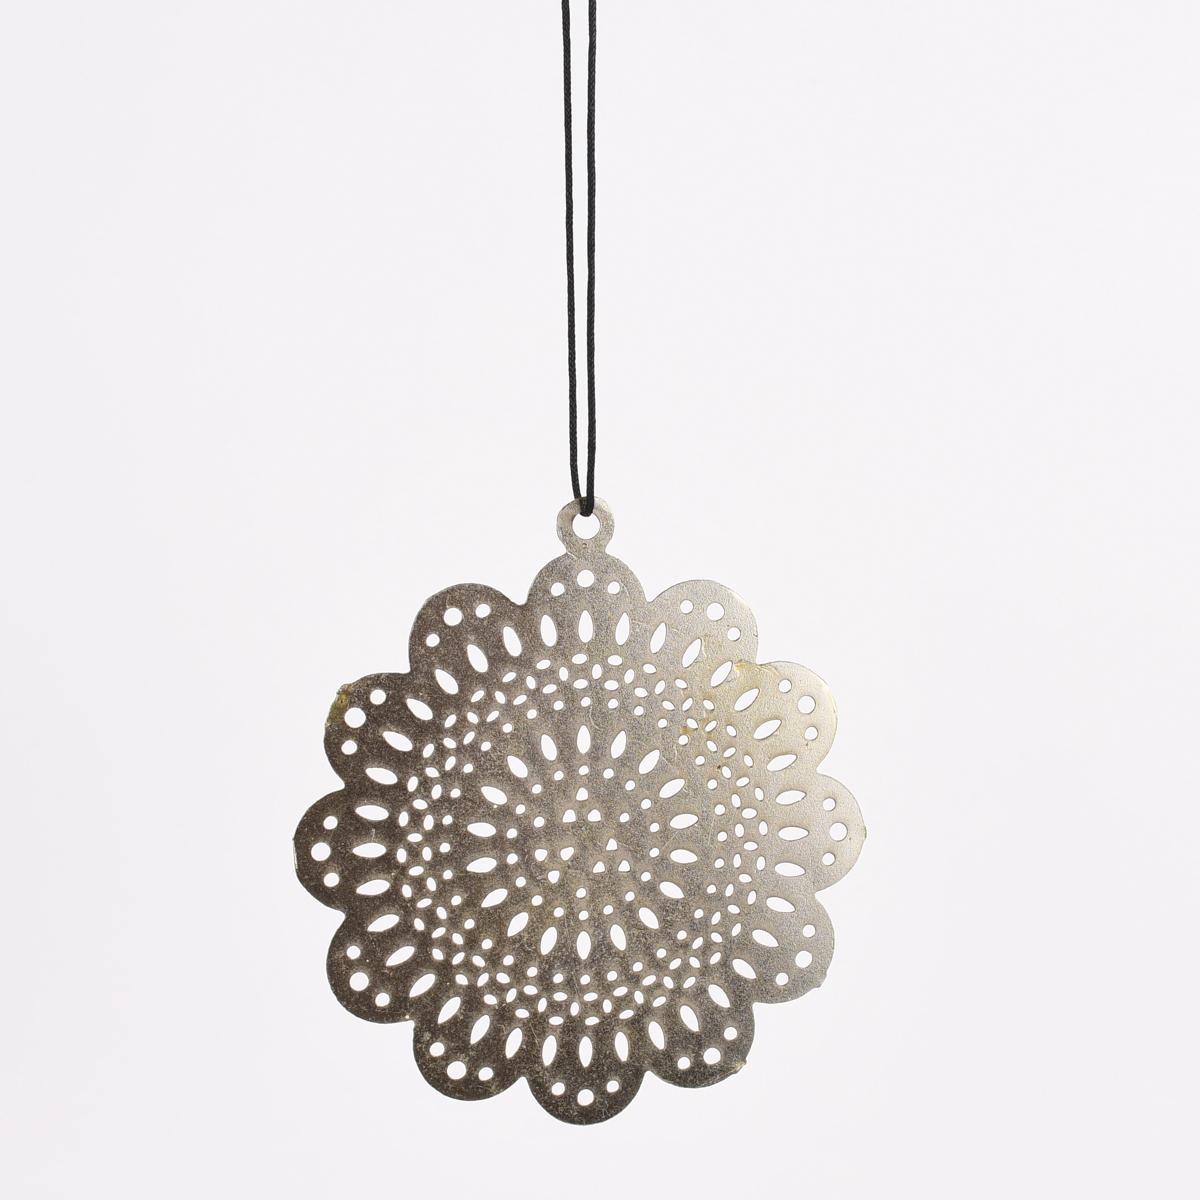 Deko Hänger Ornament Blume Metall Cut-Out silberfarbig 12cm